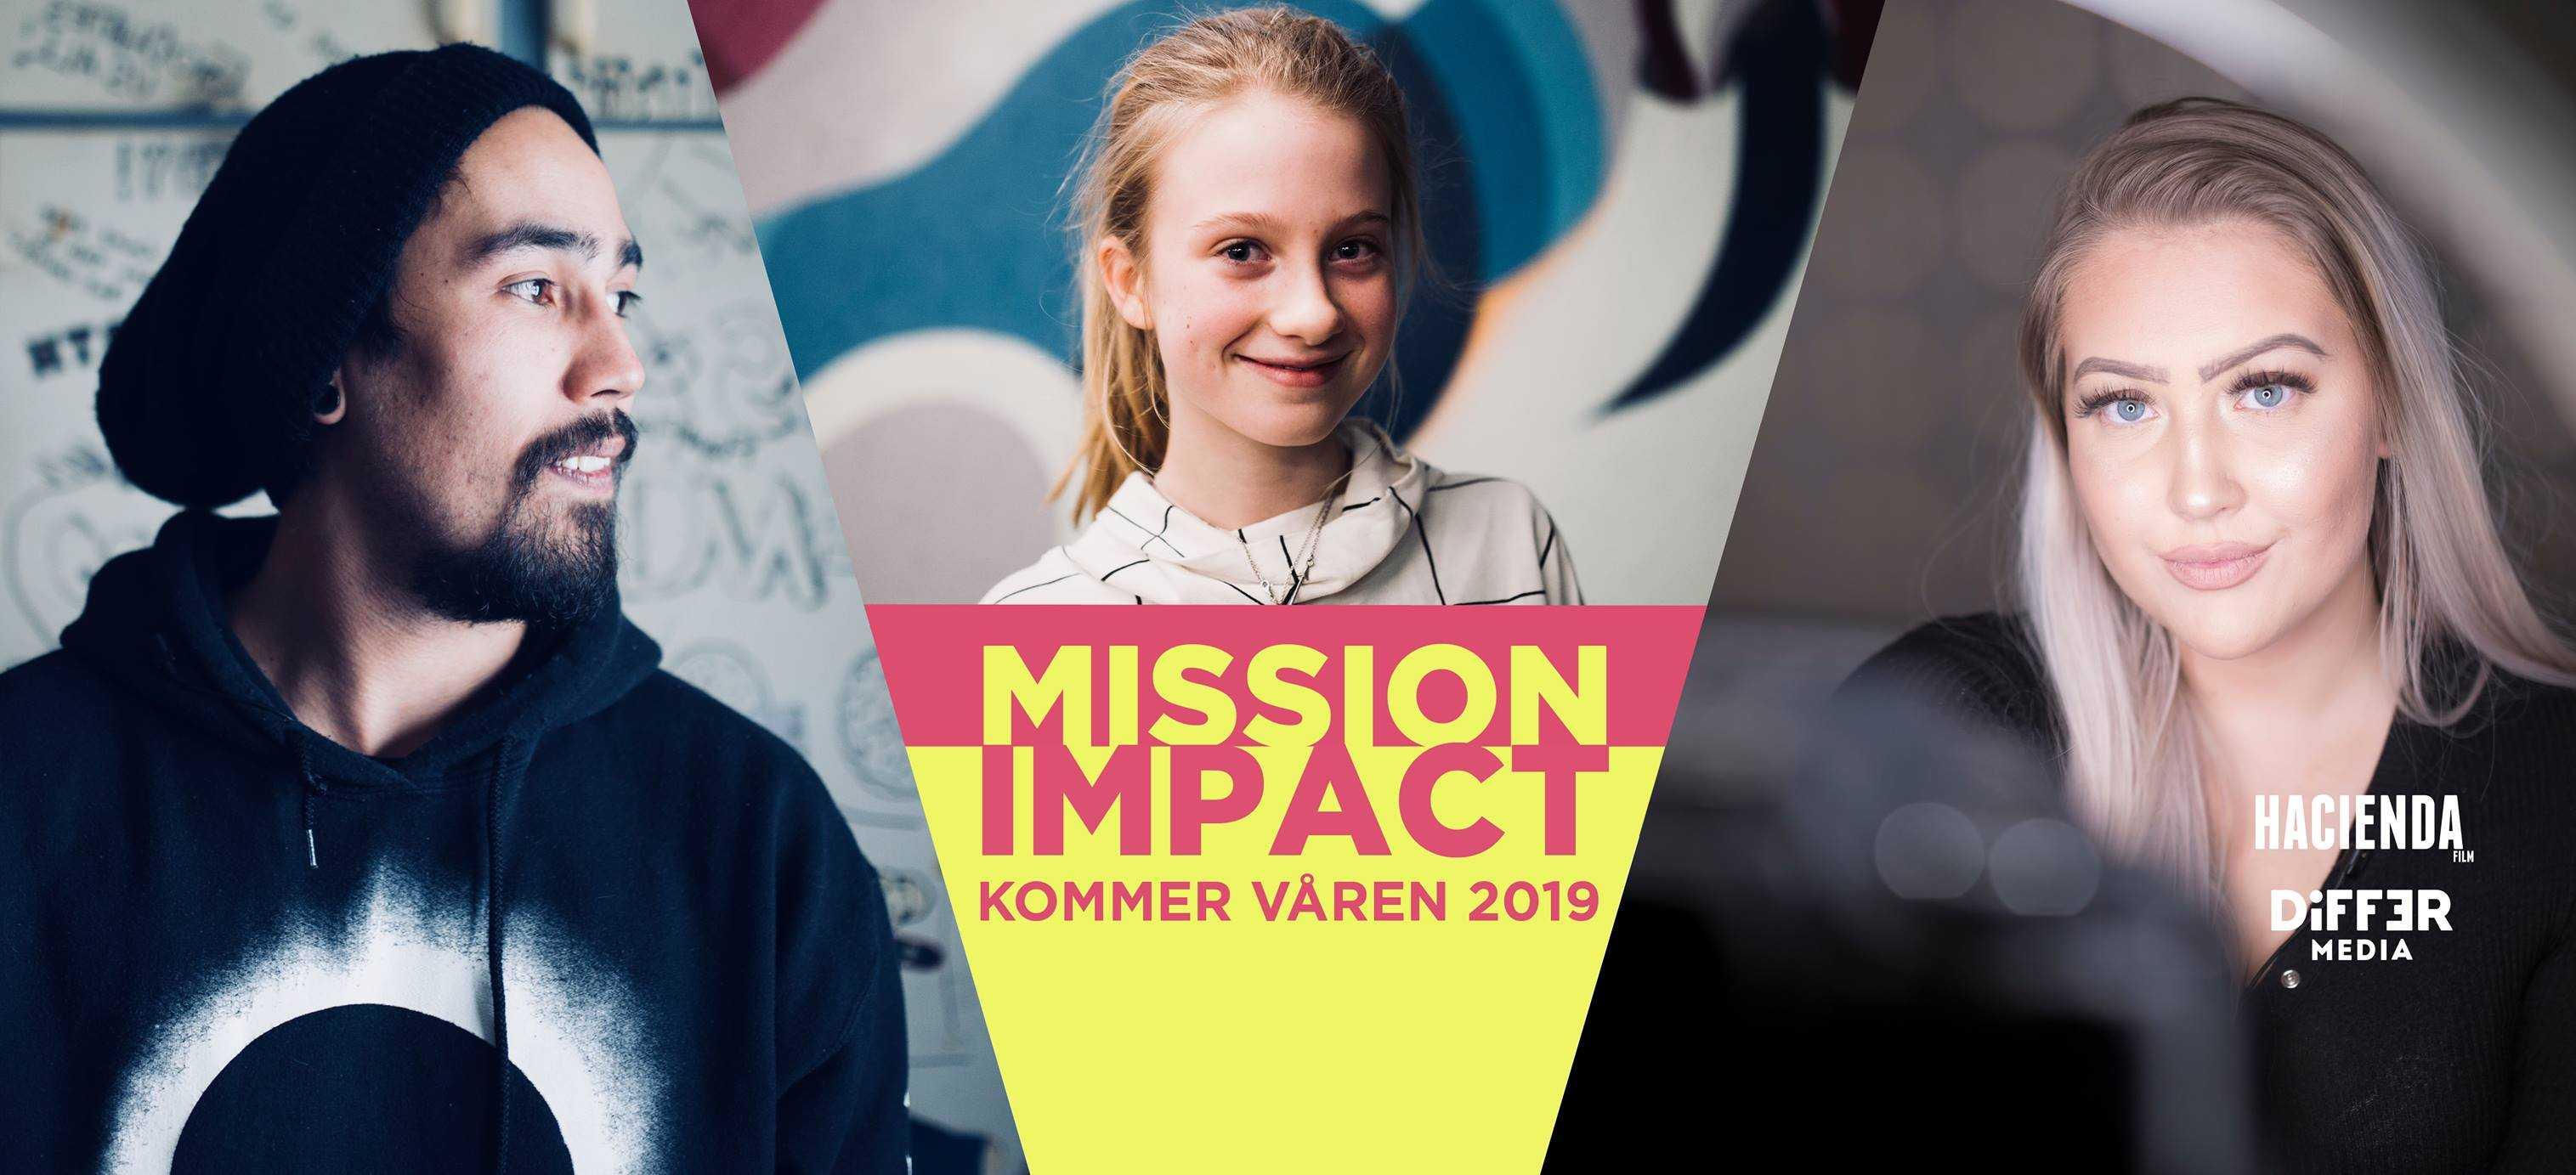 Mission-Impact.jpg#asset:6178